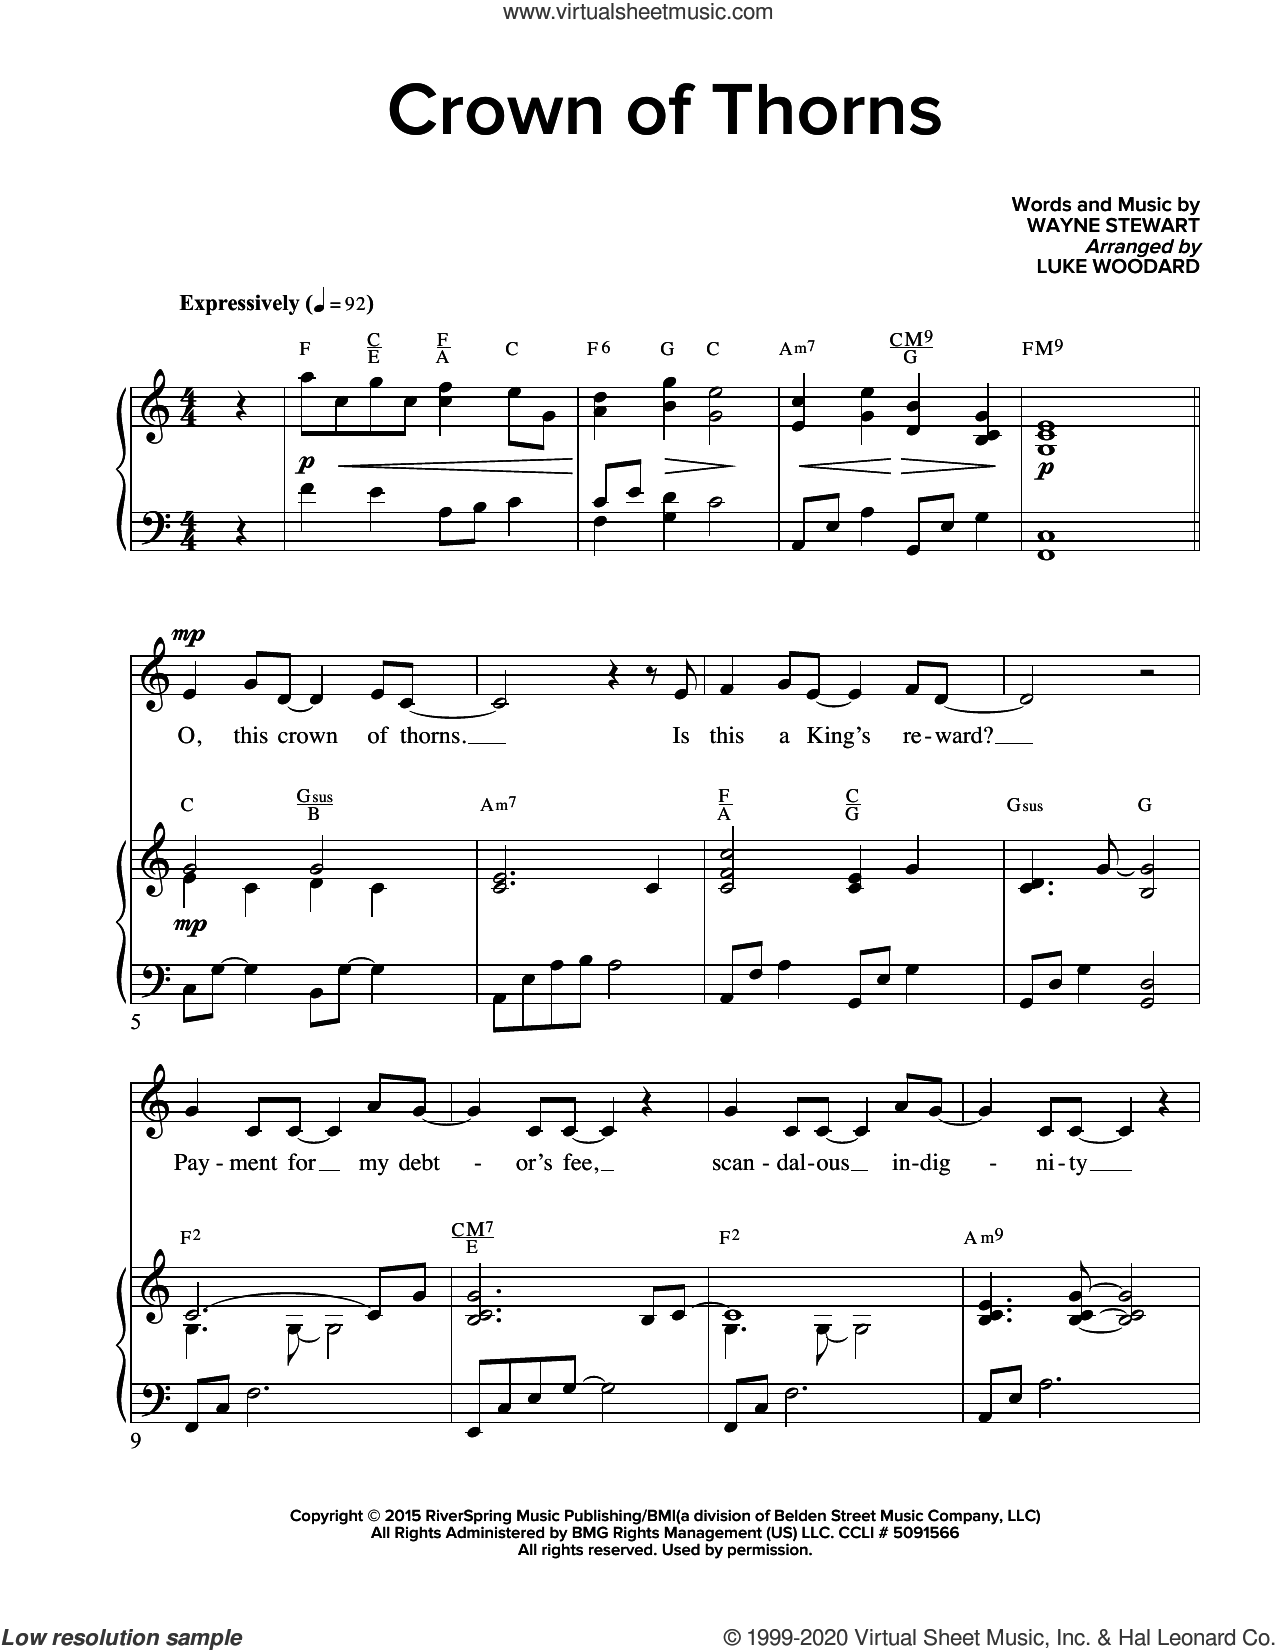 Crown Of Thorns (arr. Luke Woodard) sheet music for voice and piano by Wayne Stewart and Luke Woodard, intermediate skill level